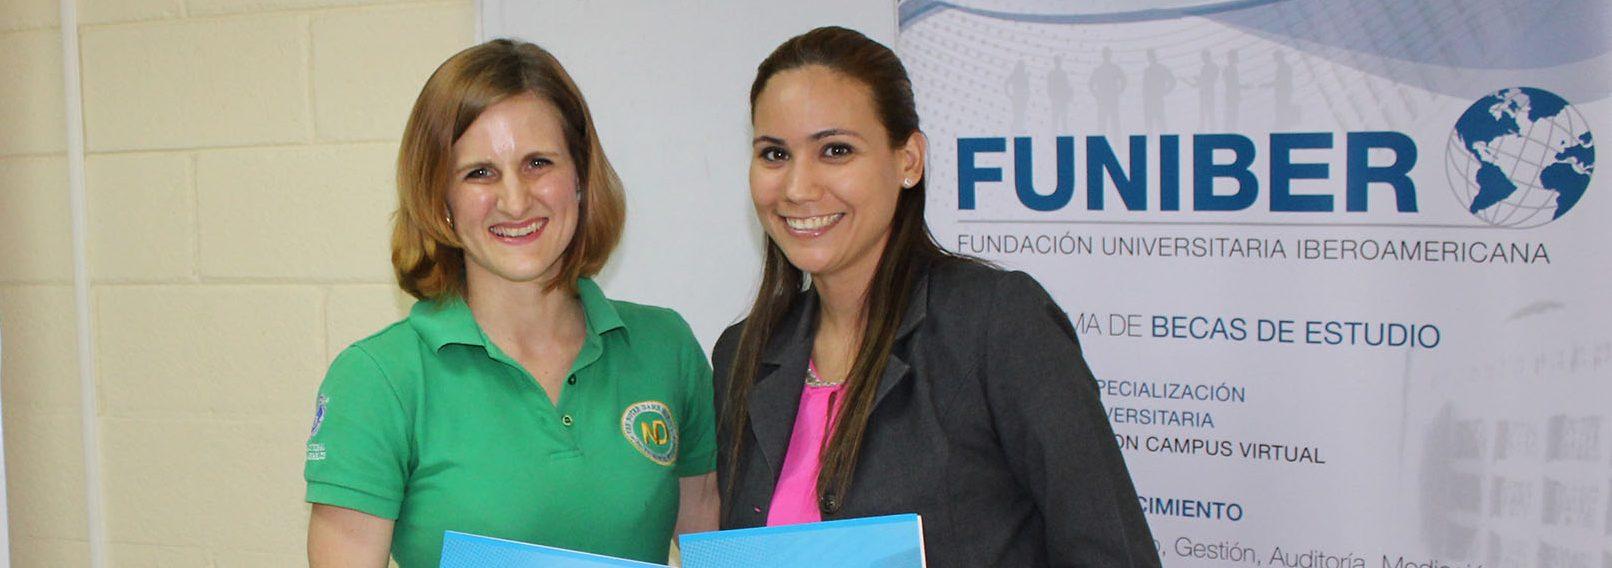 FUNIBER firma un convenio de becas con The Notre Dame School en Nicaragua